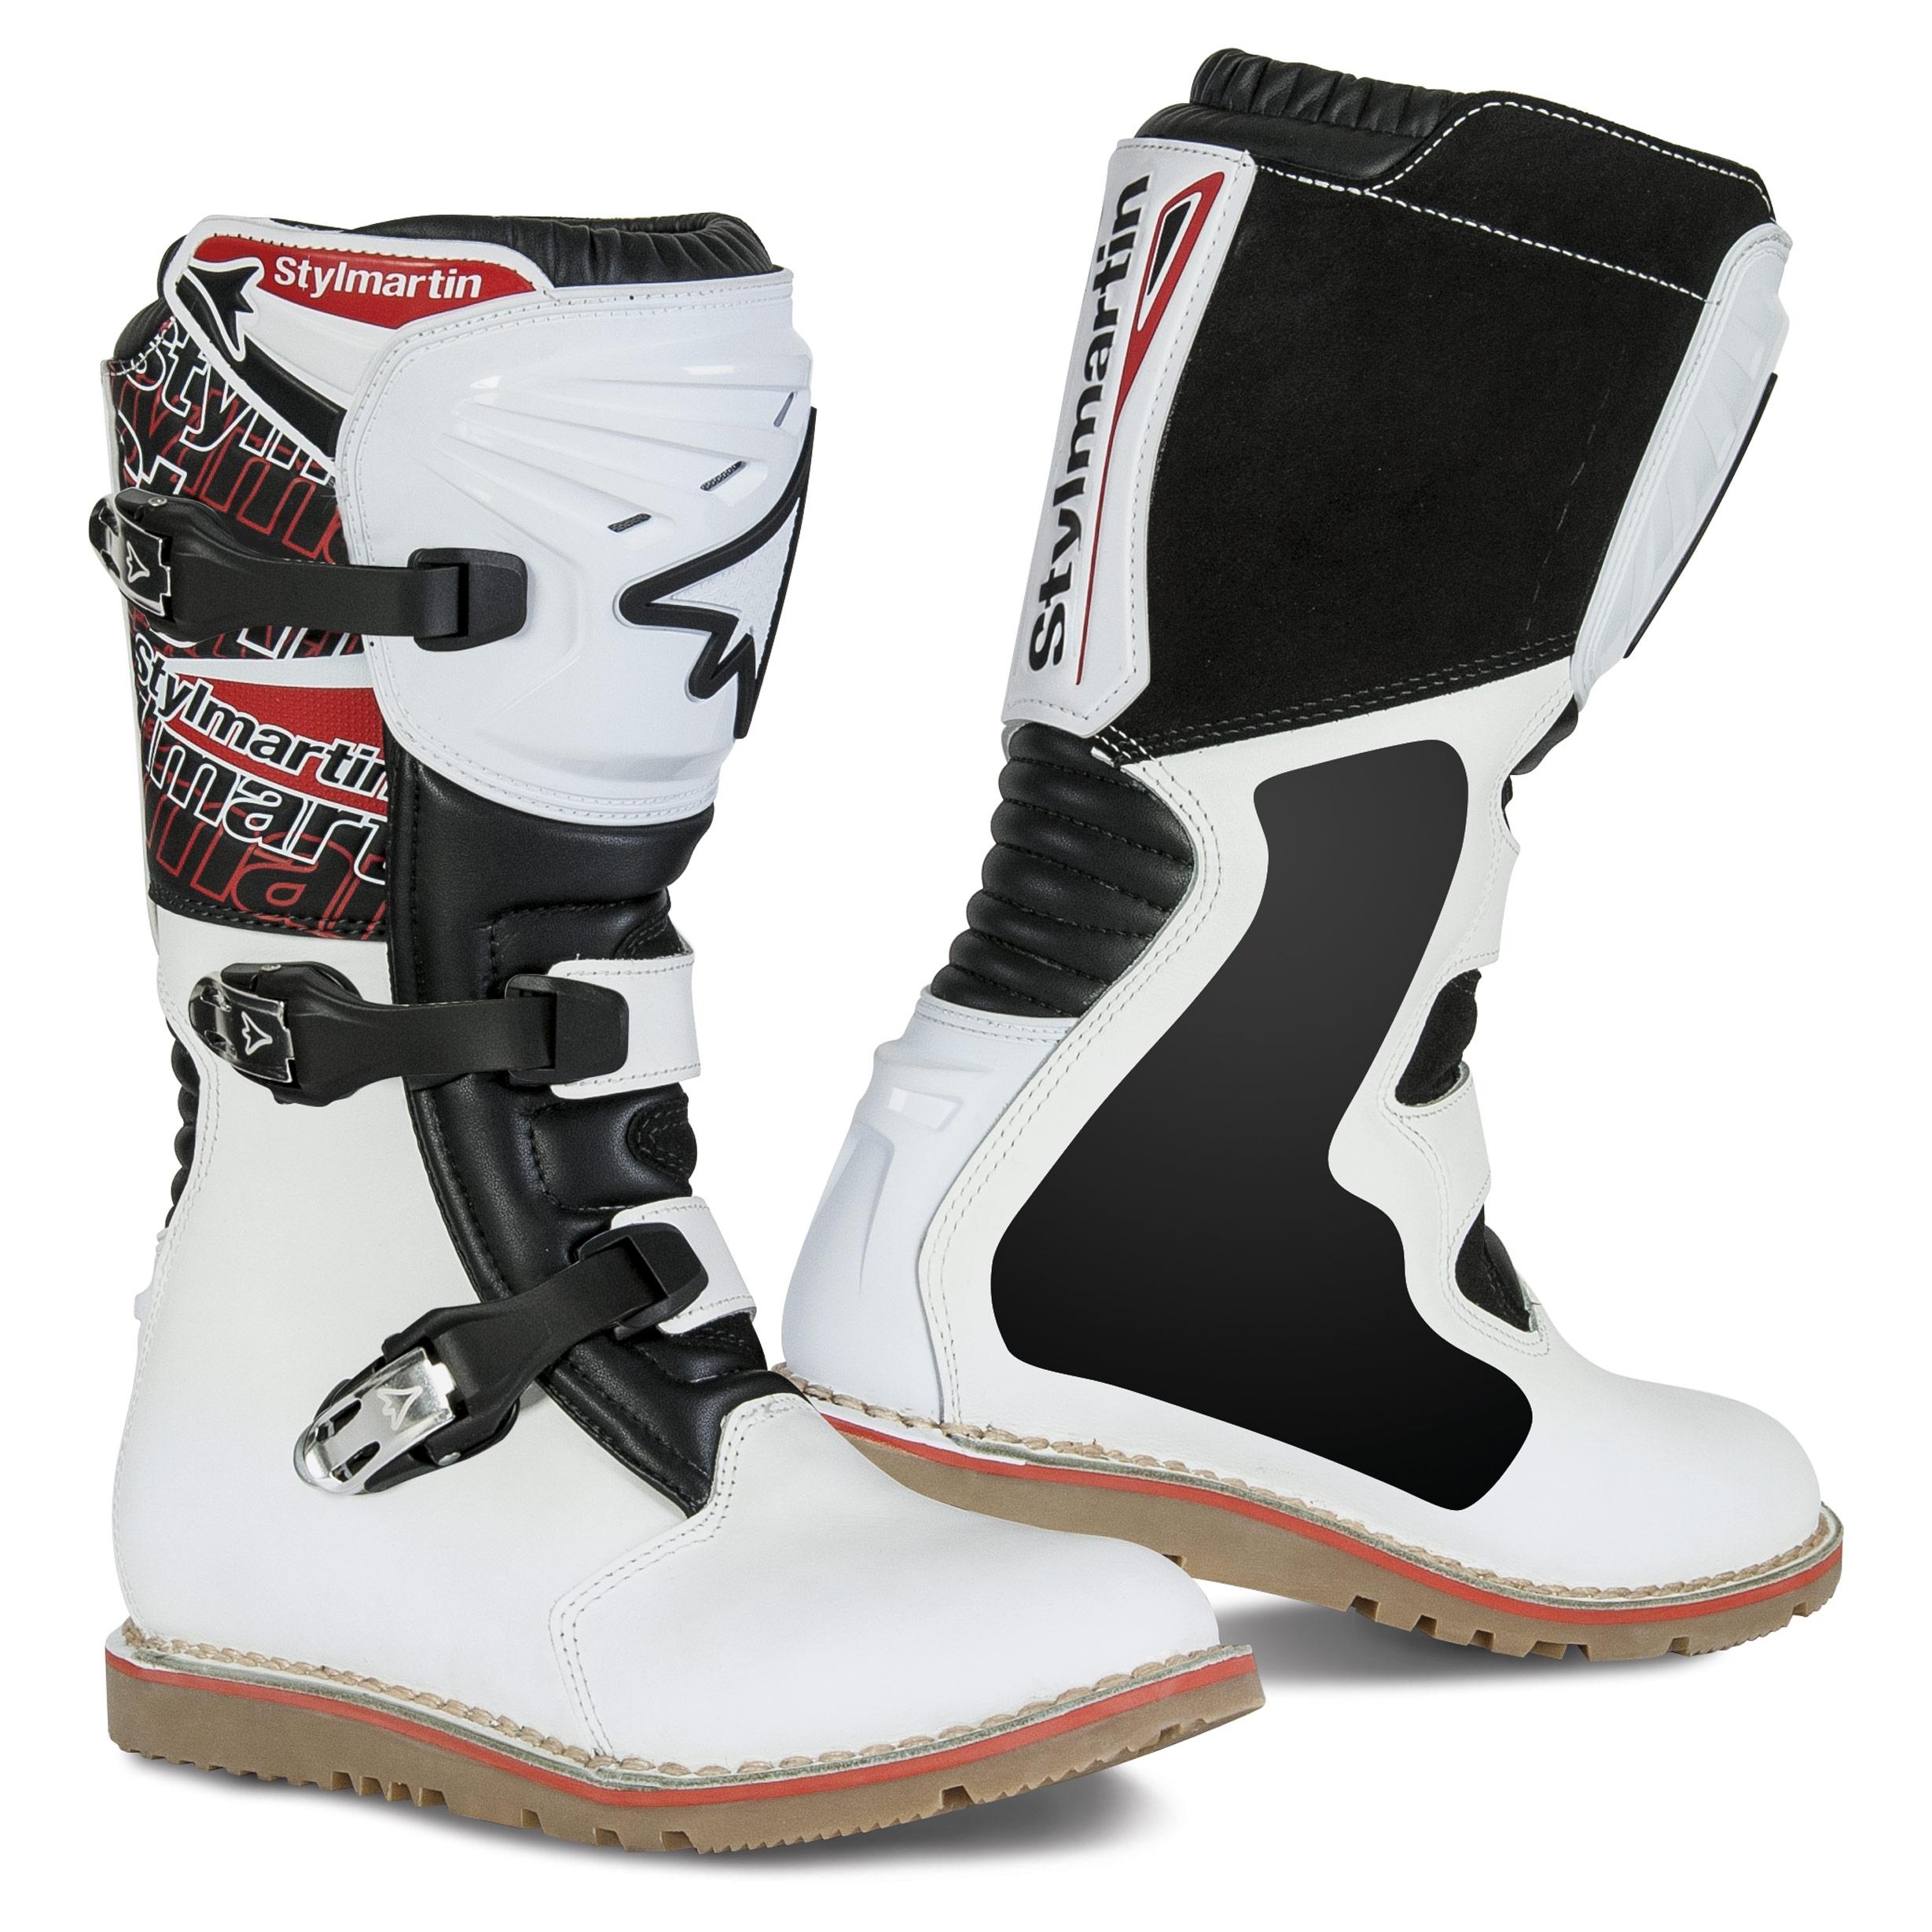 Stylmartin Impact Evo Trial Boots White